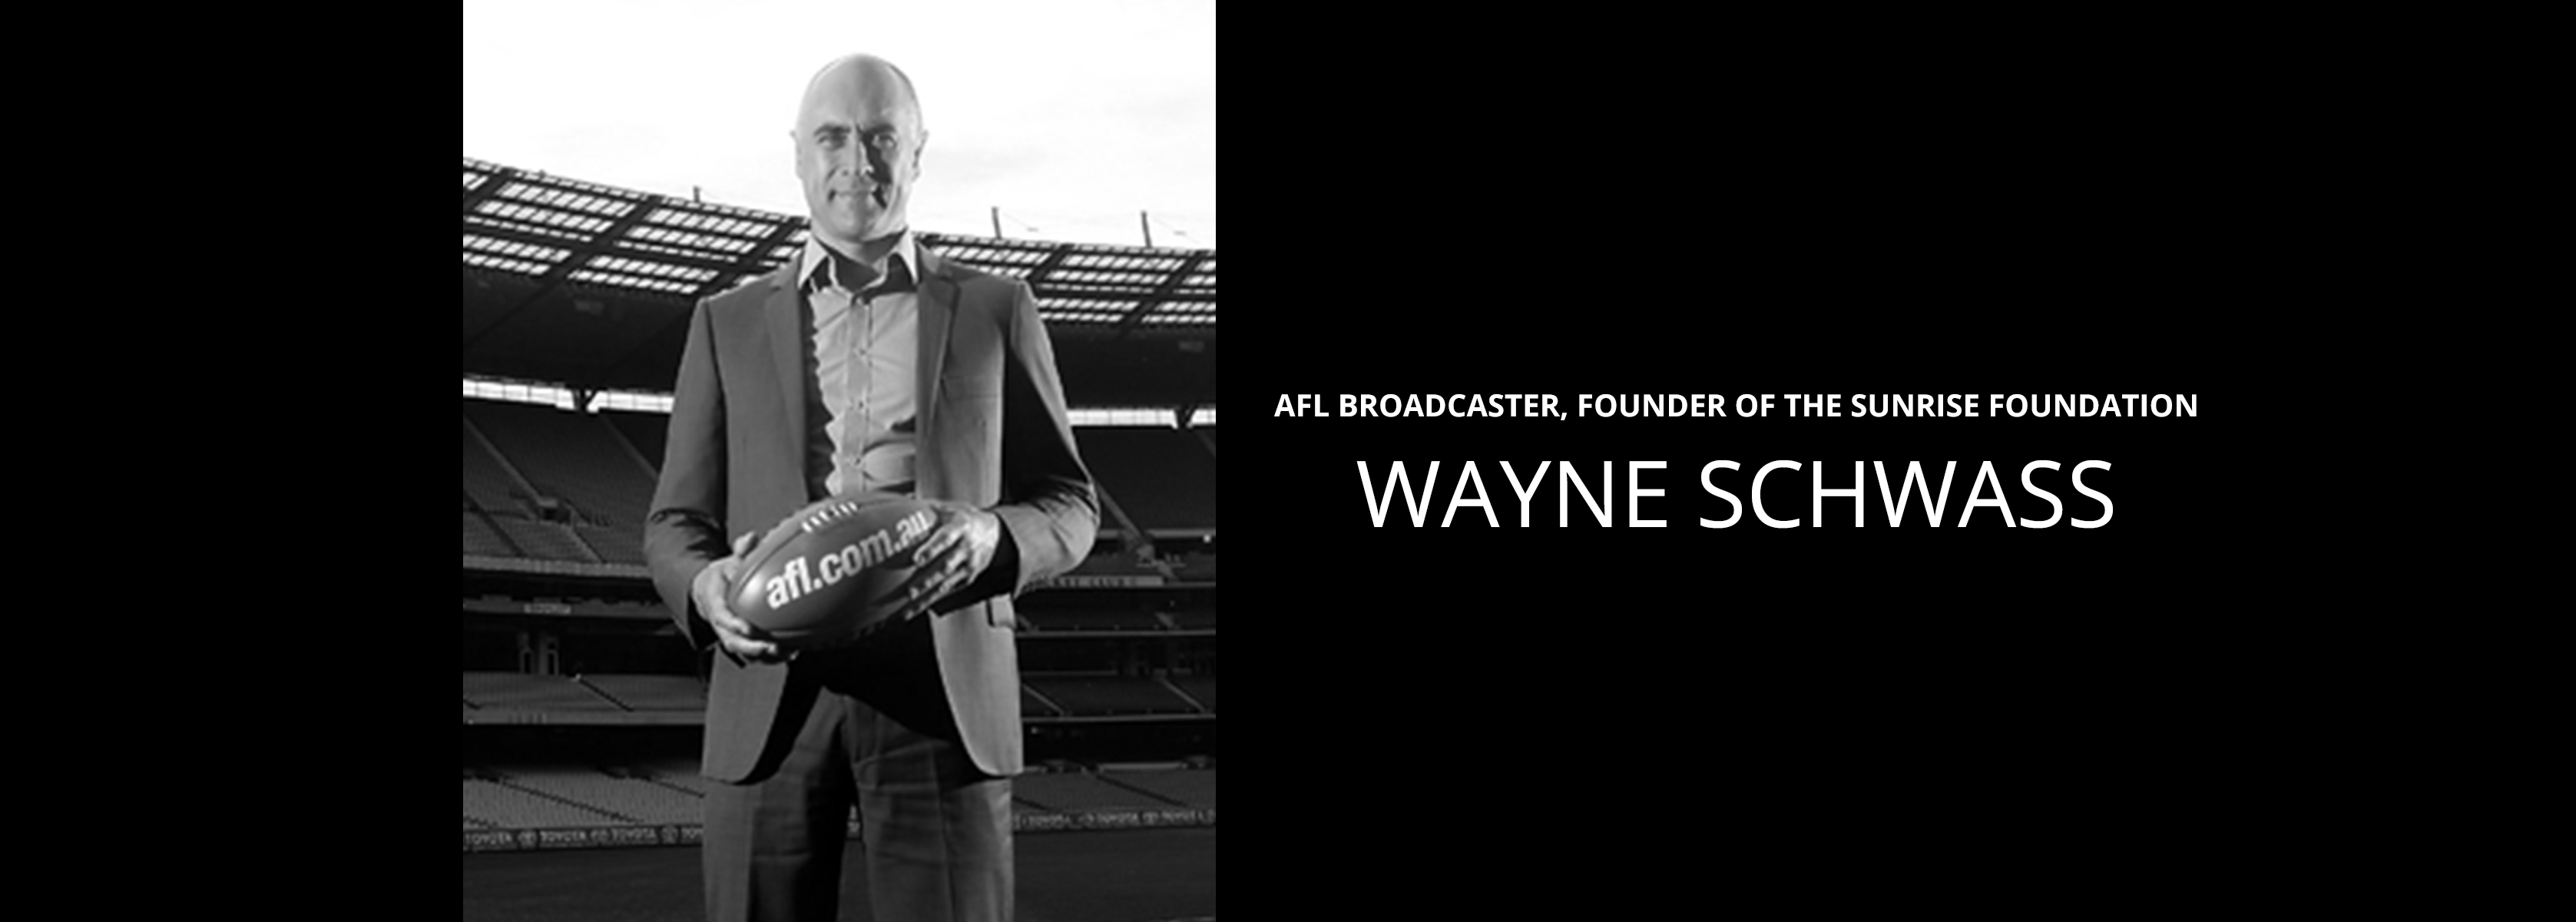 Wayne Schwass - AFL Broadcaster, Founder of the Sunrise Foundation - Bravo Talent Management